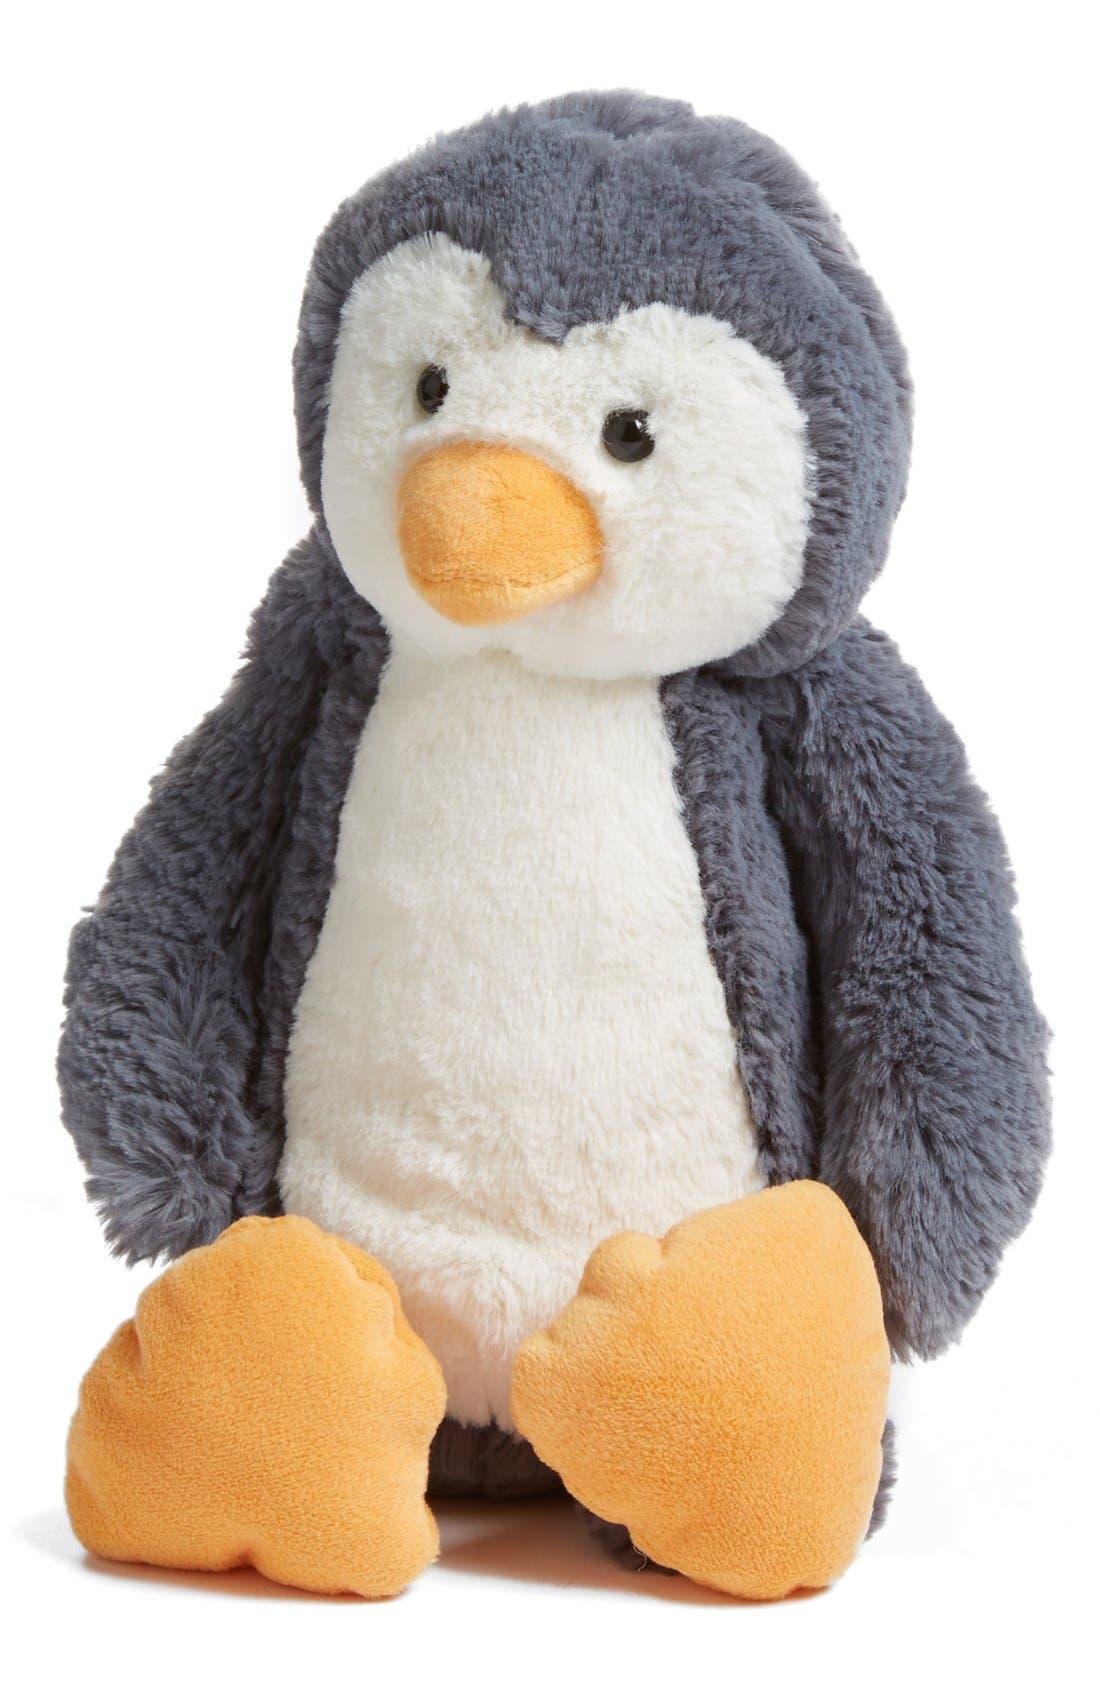 Alternate Image 1 Selected - Jellycat 'Bashful Penguin' Stuffed Animal